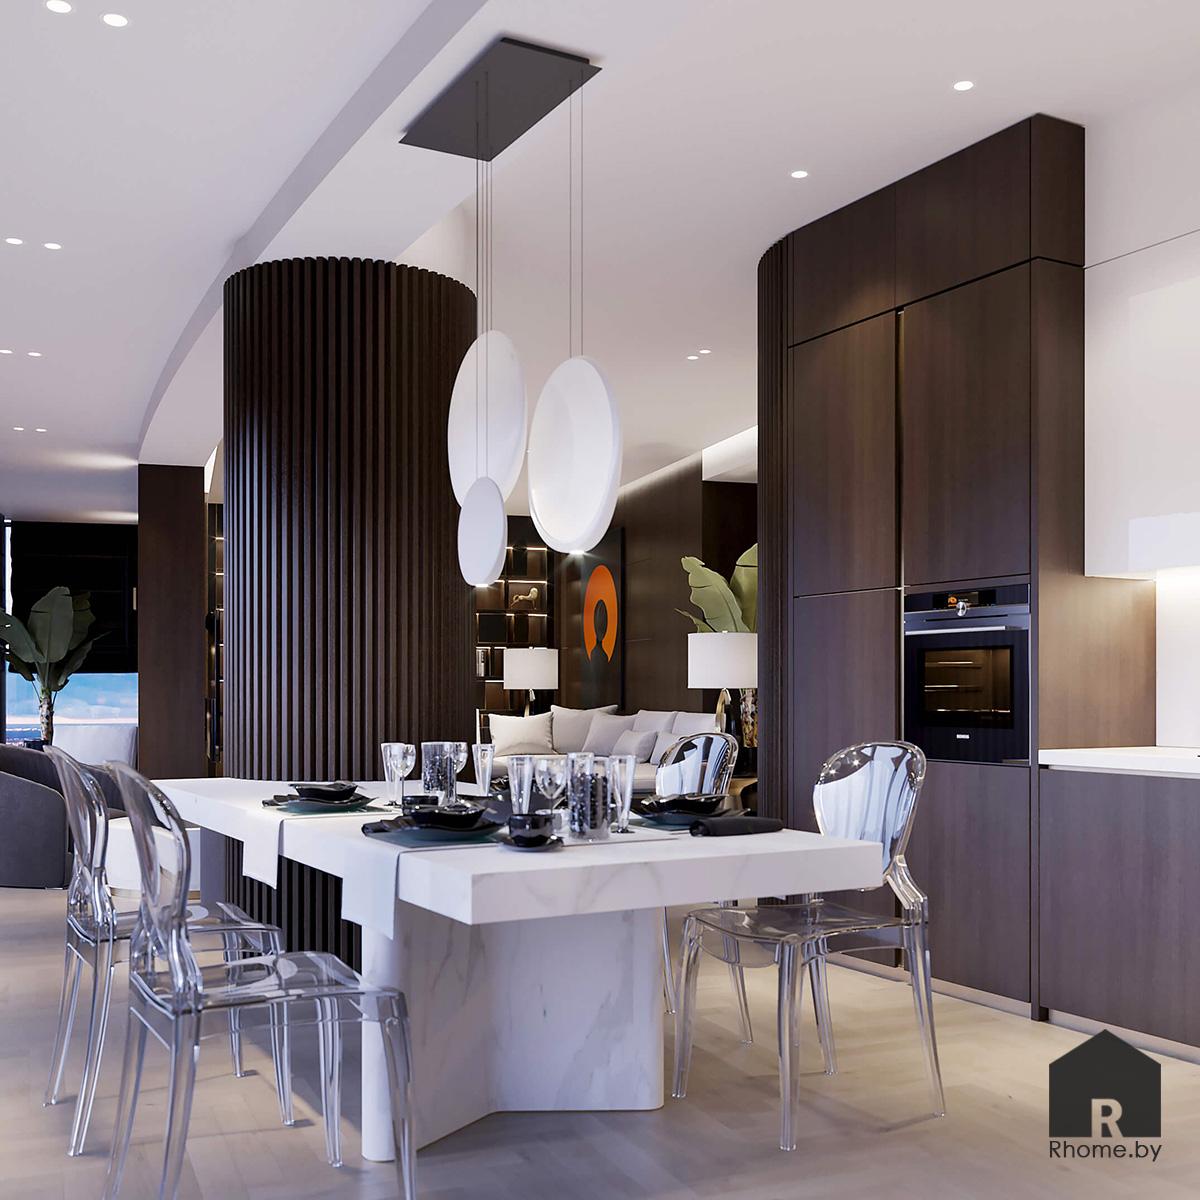 Столовая | Дизайн студия – Rhome.by